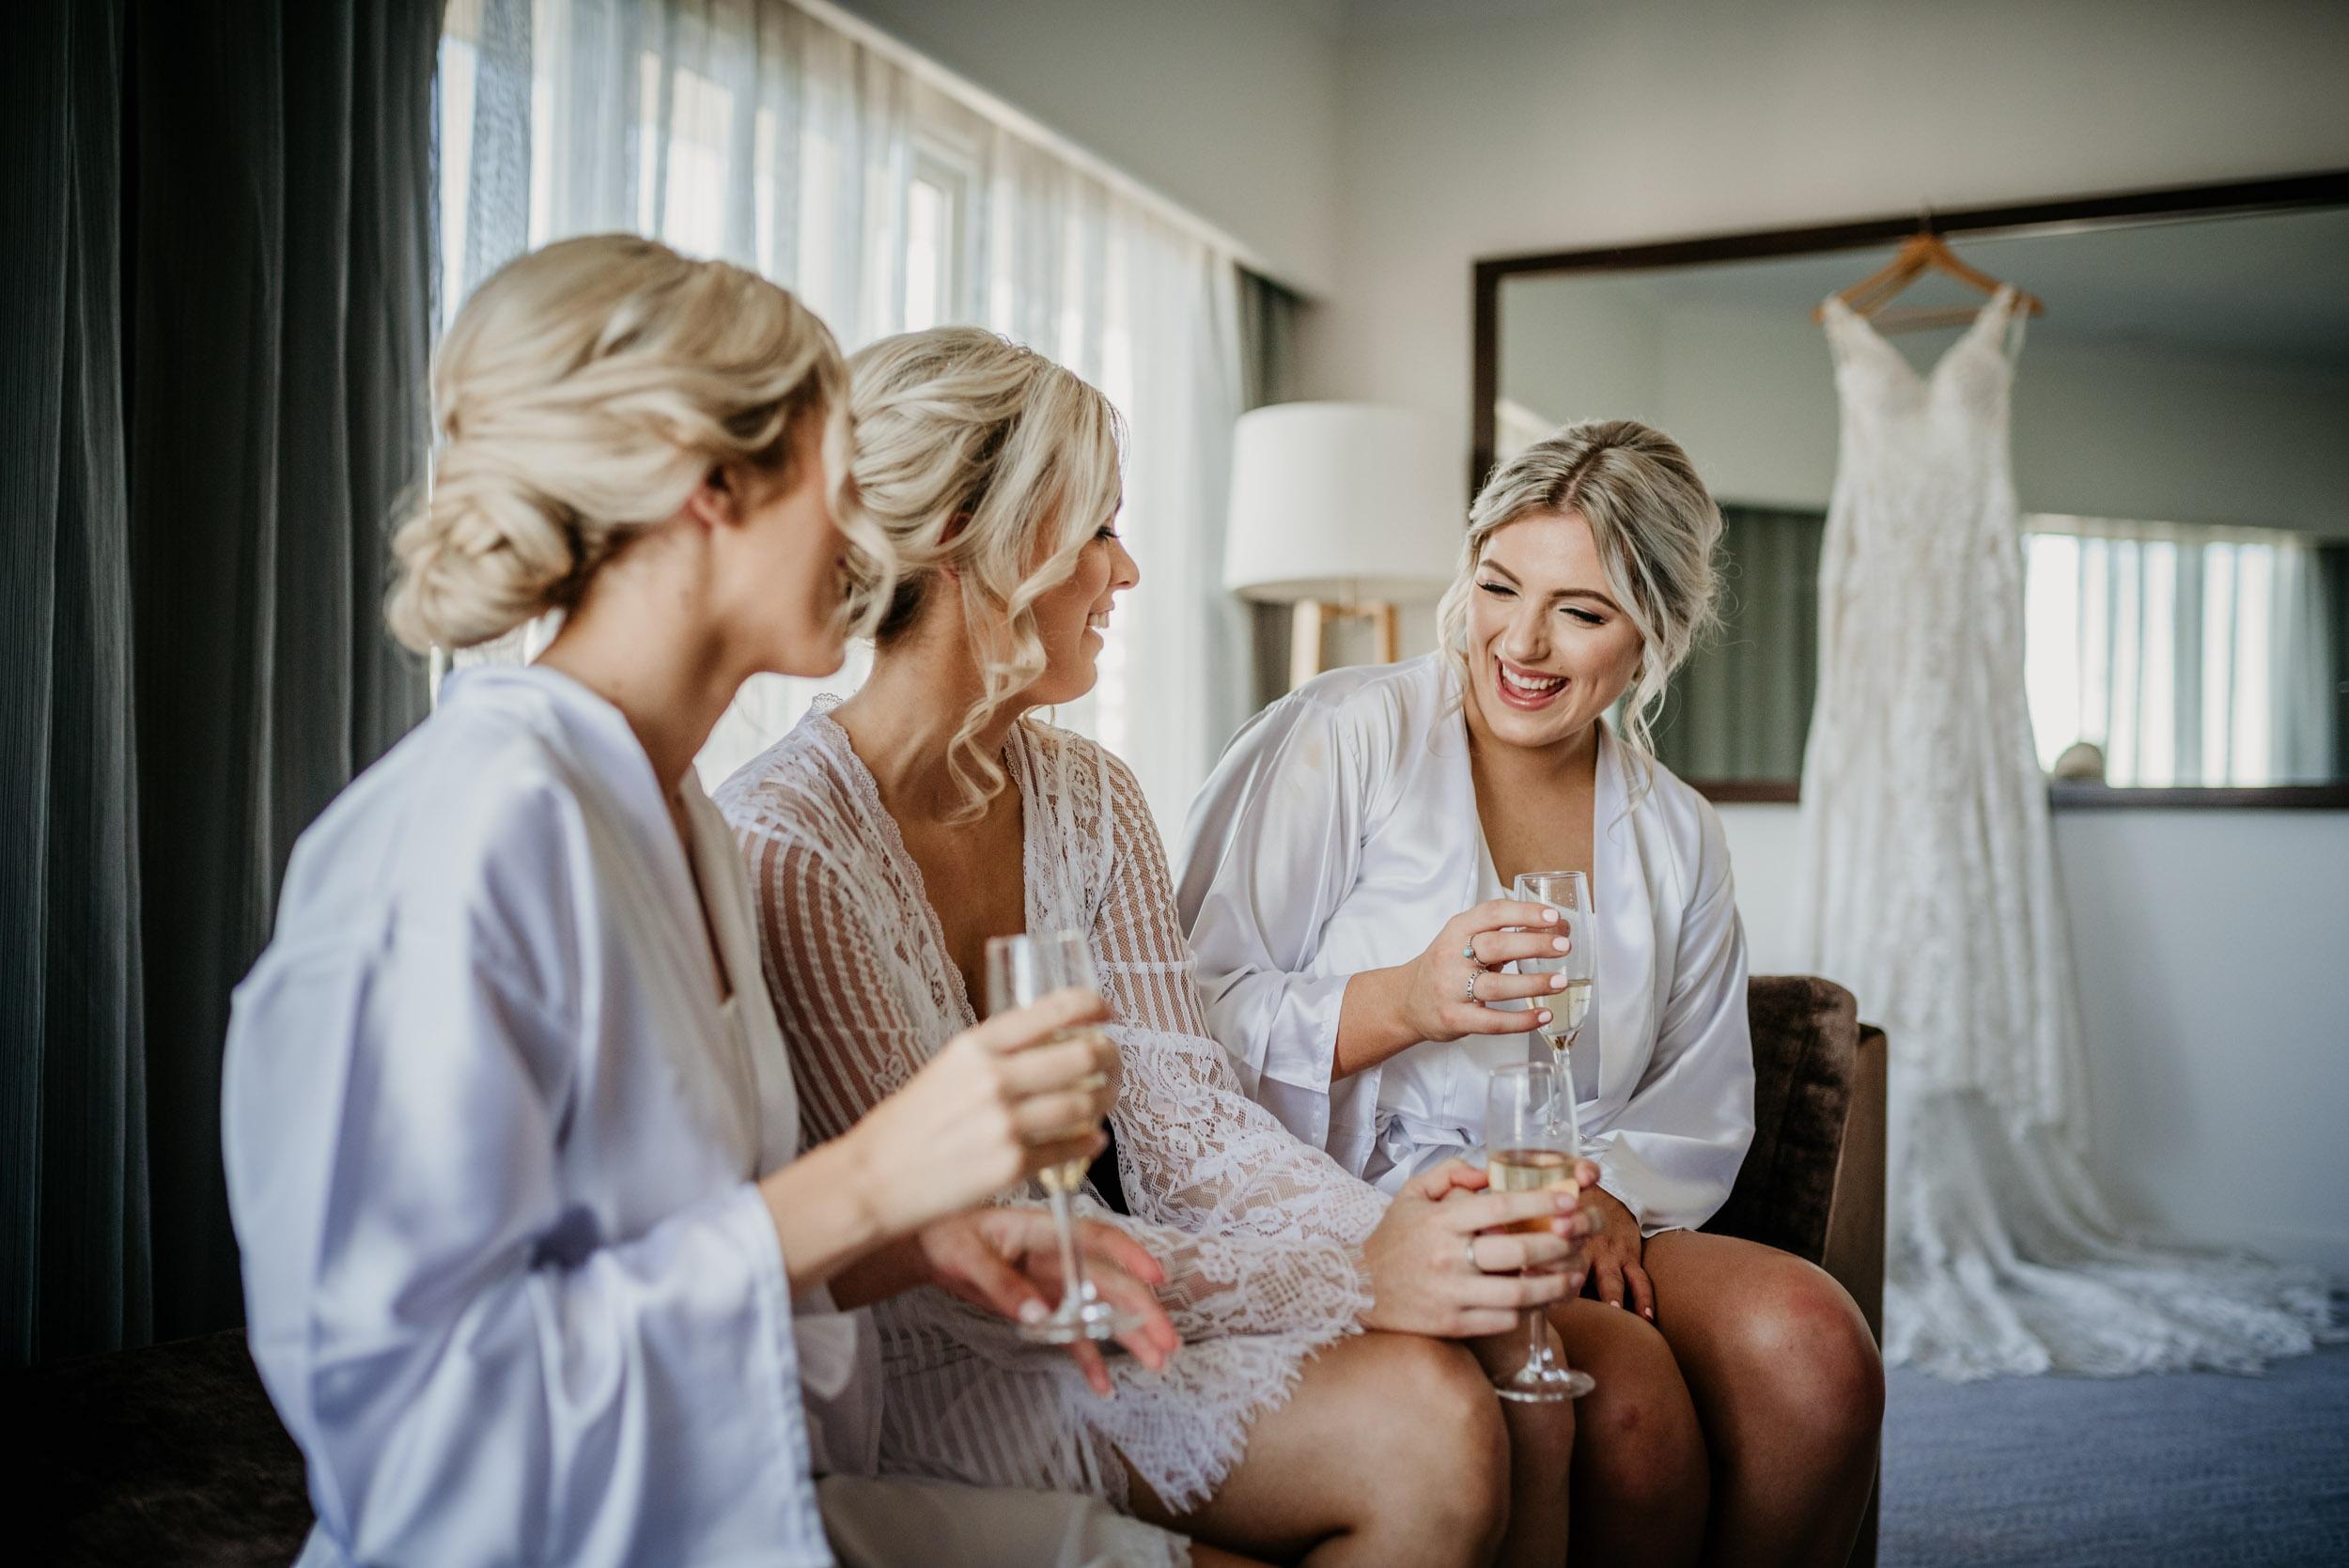 The Raw Photographer - Cairns Wedding Photographer - Laloli - Cairns Garden Wedding - Bride Dress - Destination Wed - Outdoor Reception - Queensland Ceremony-18.jpg